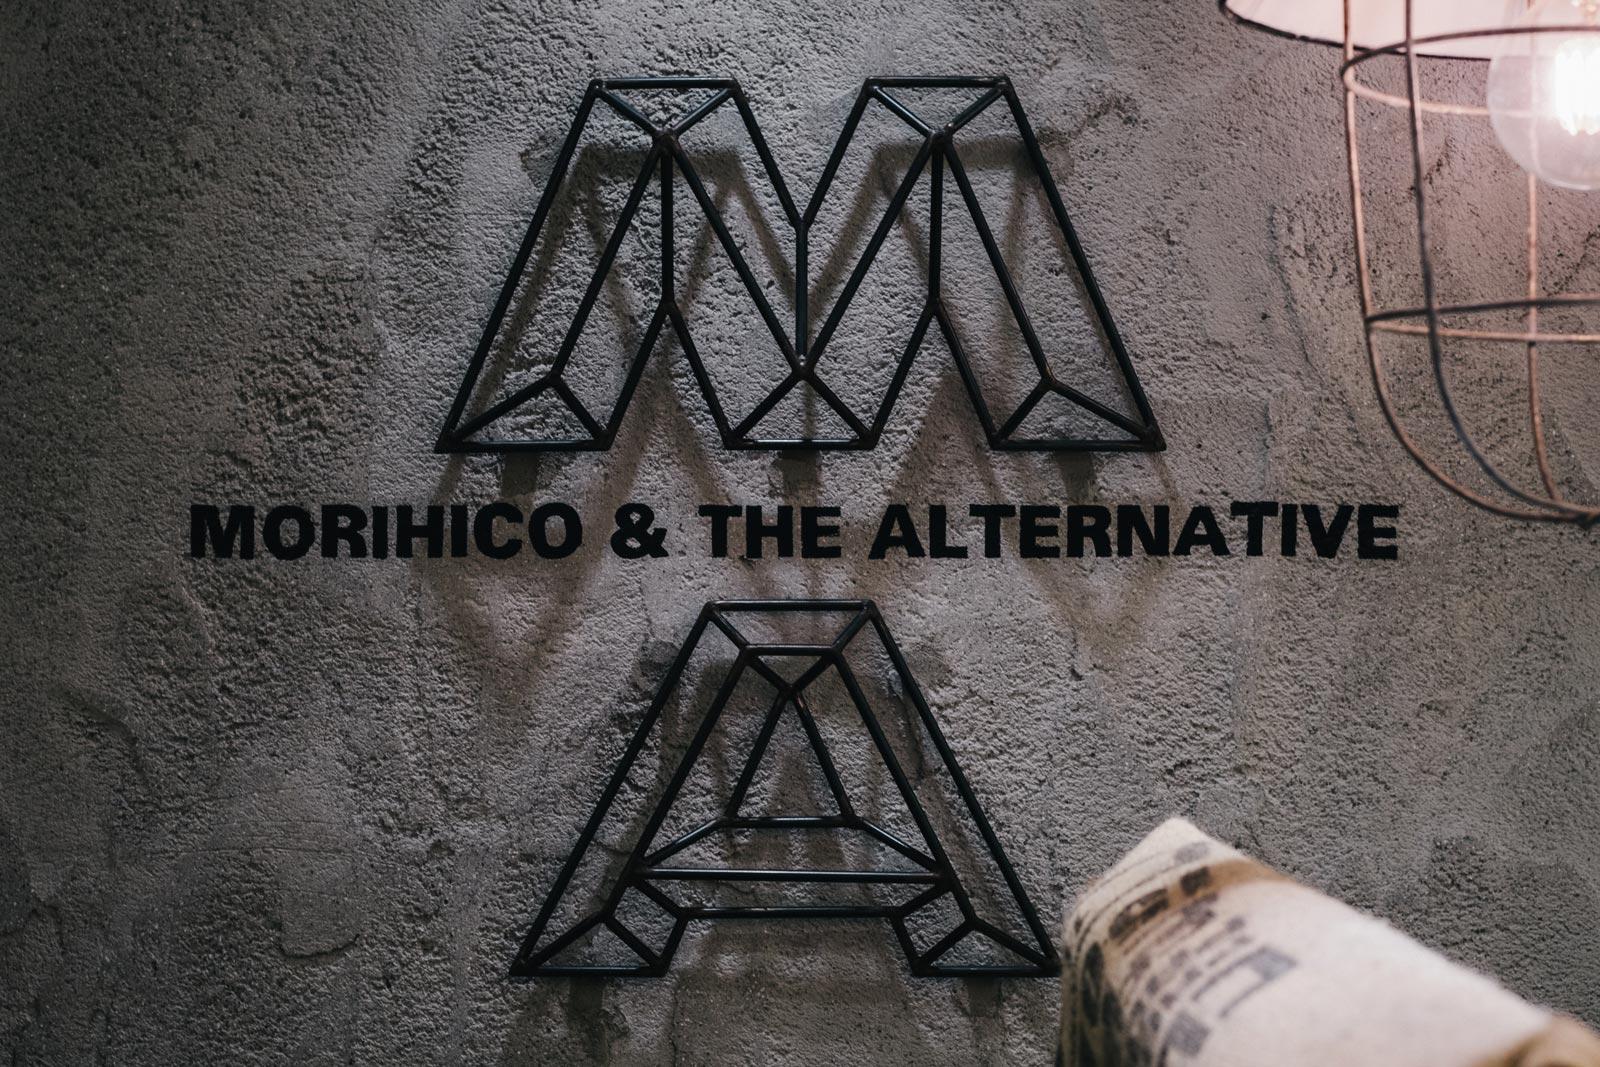 MORIHICO THE ALTERNATIVE